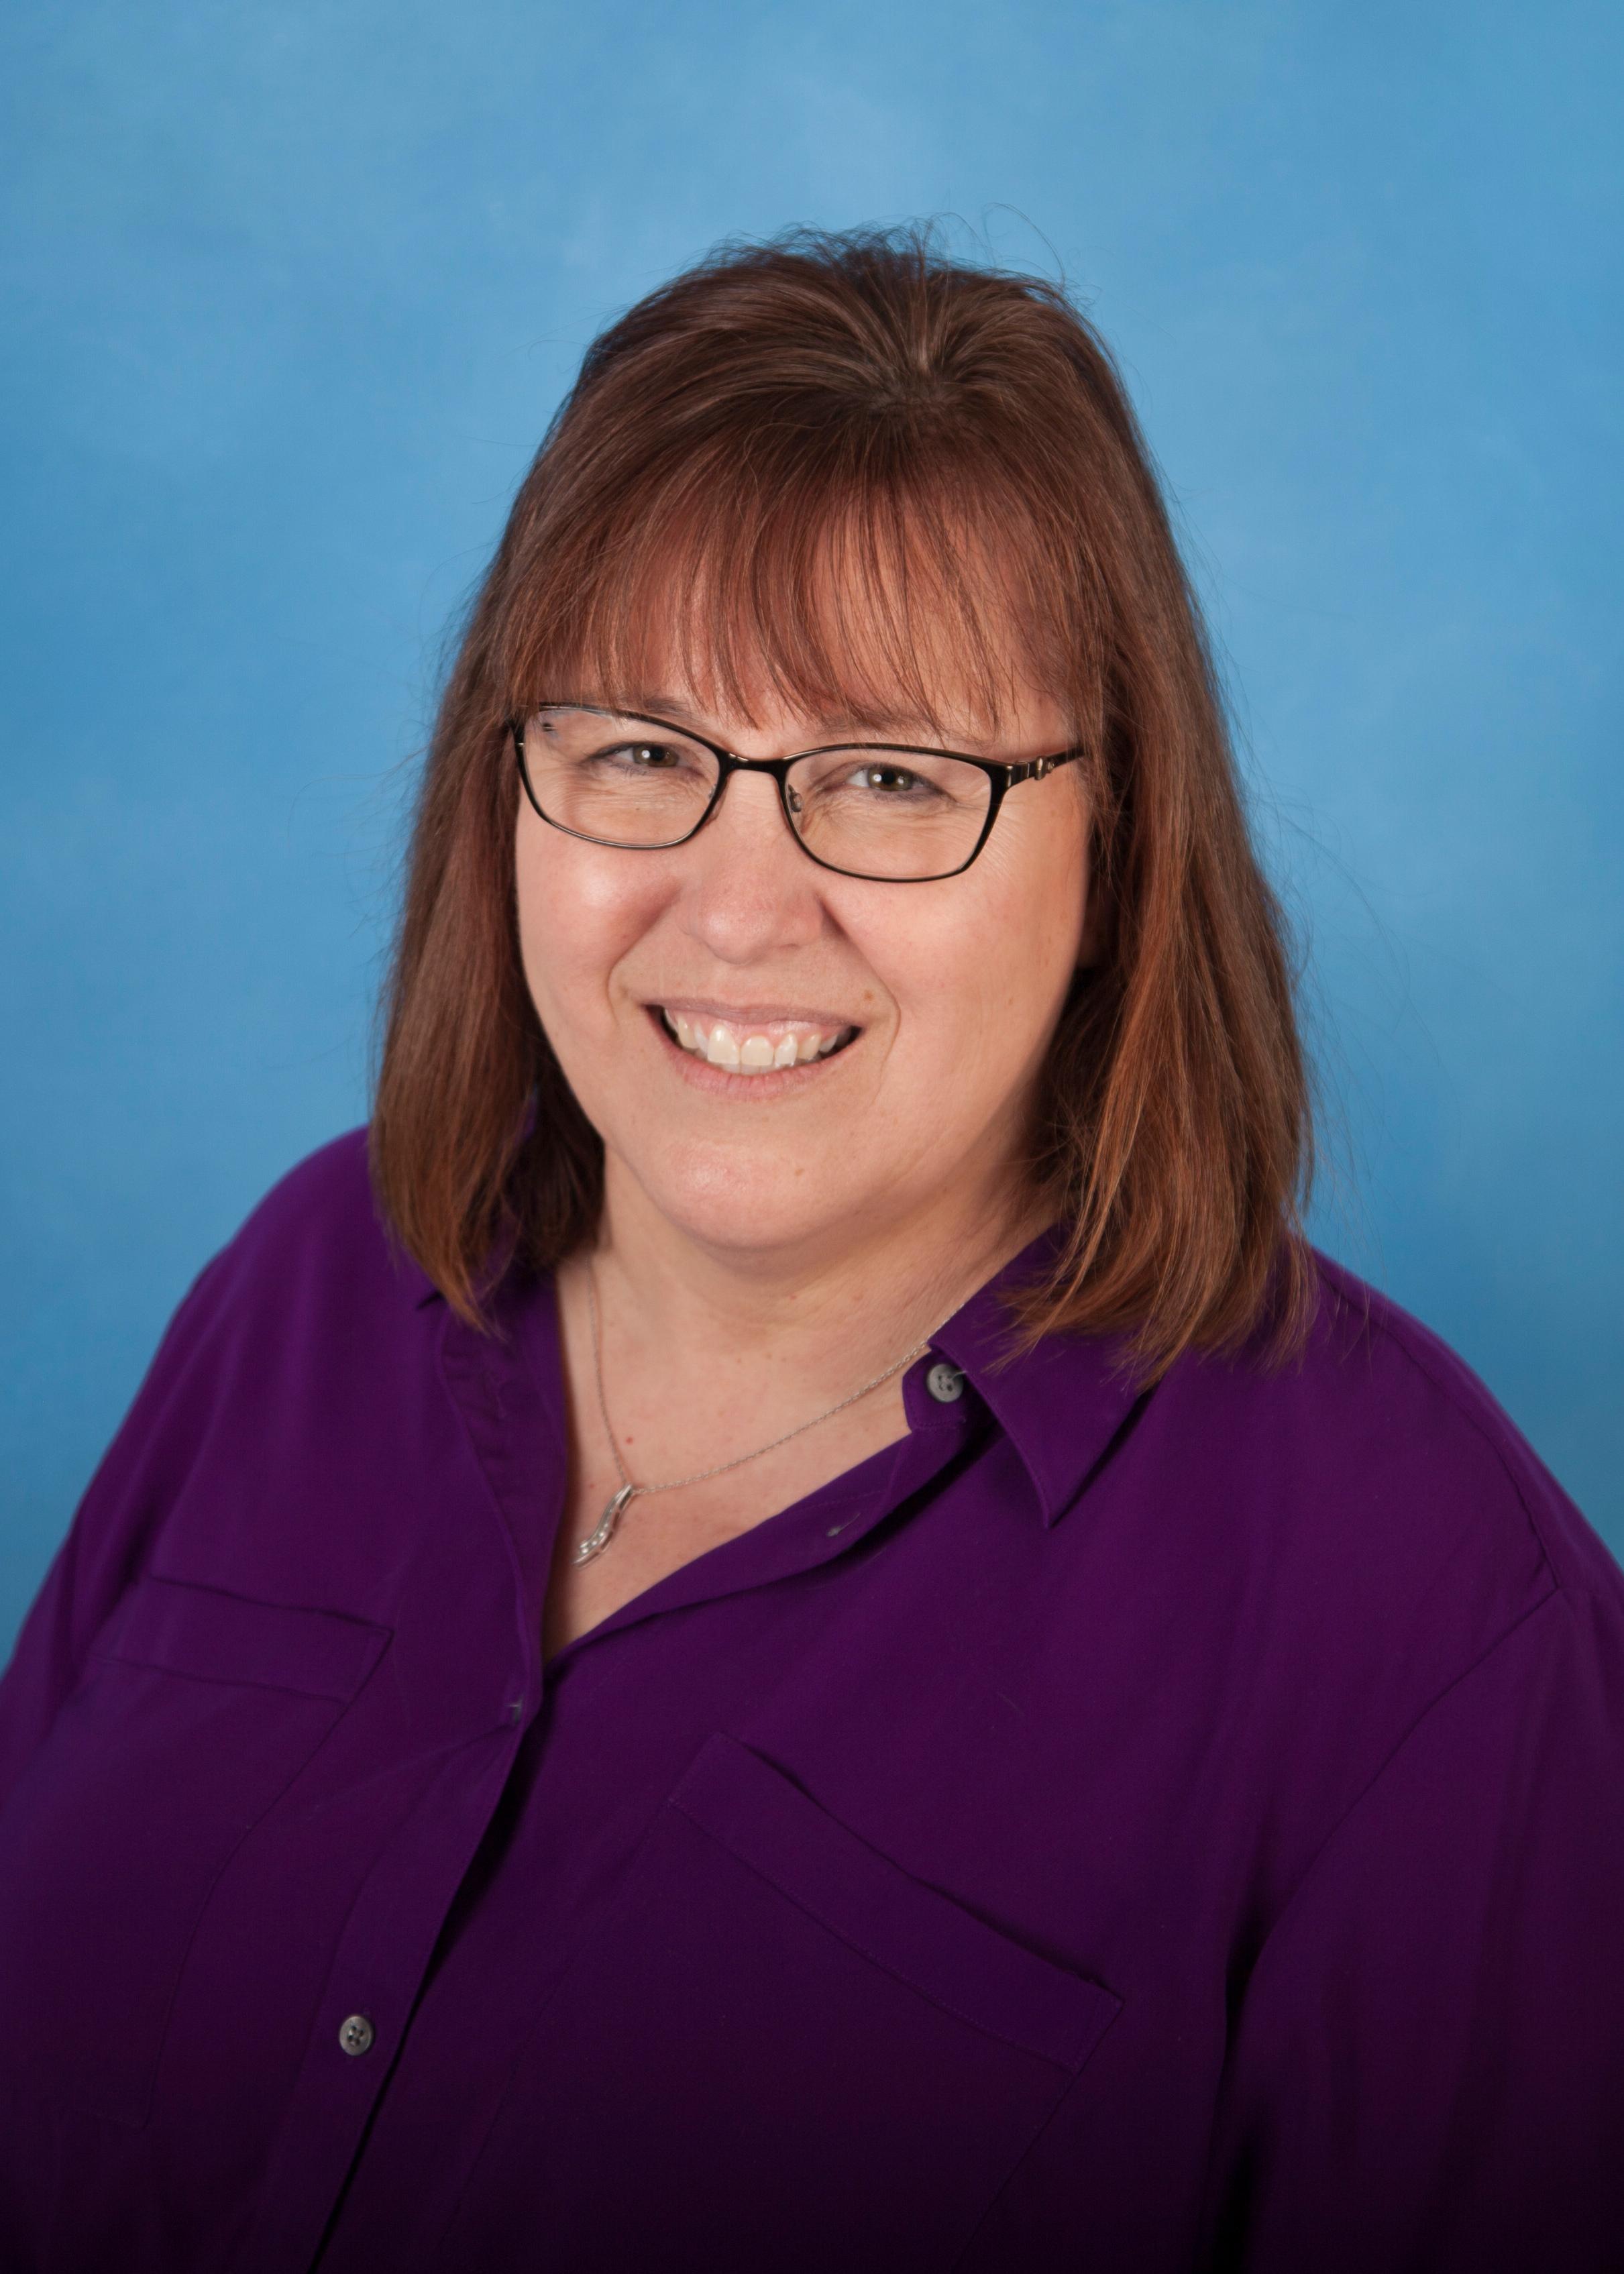 Carla Bruning, Board Treasurer